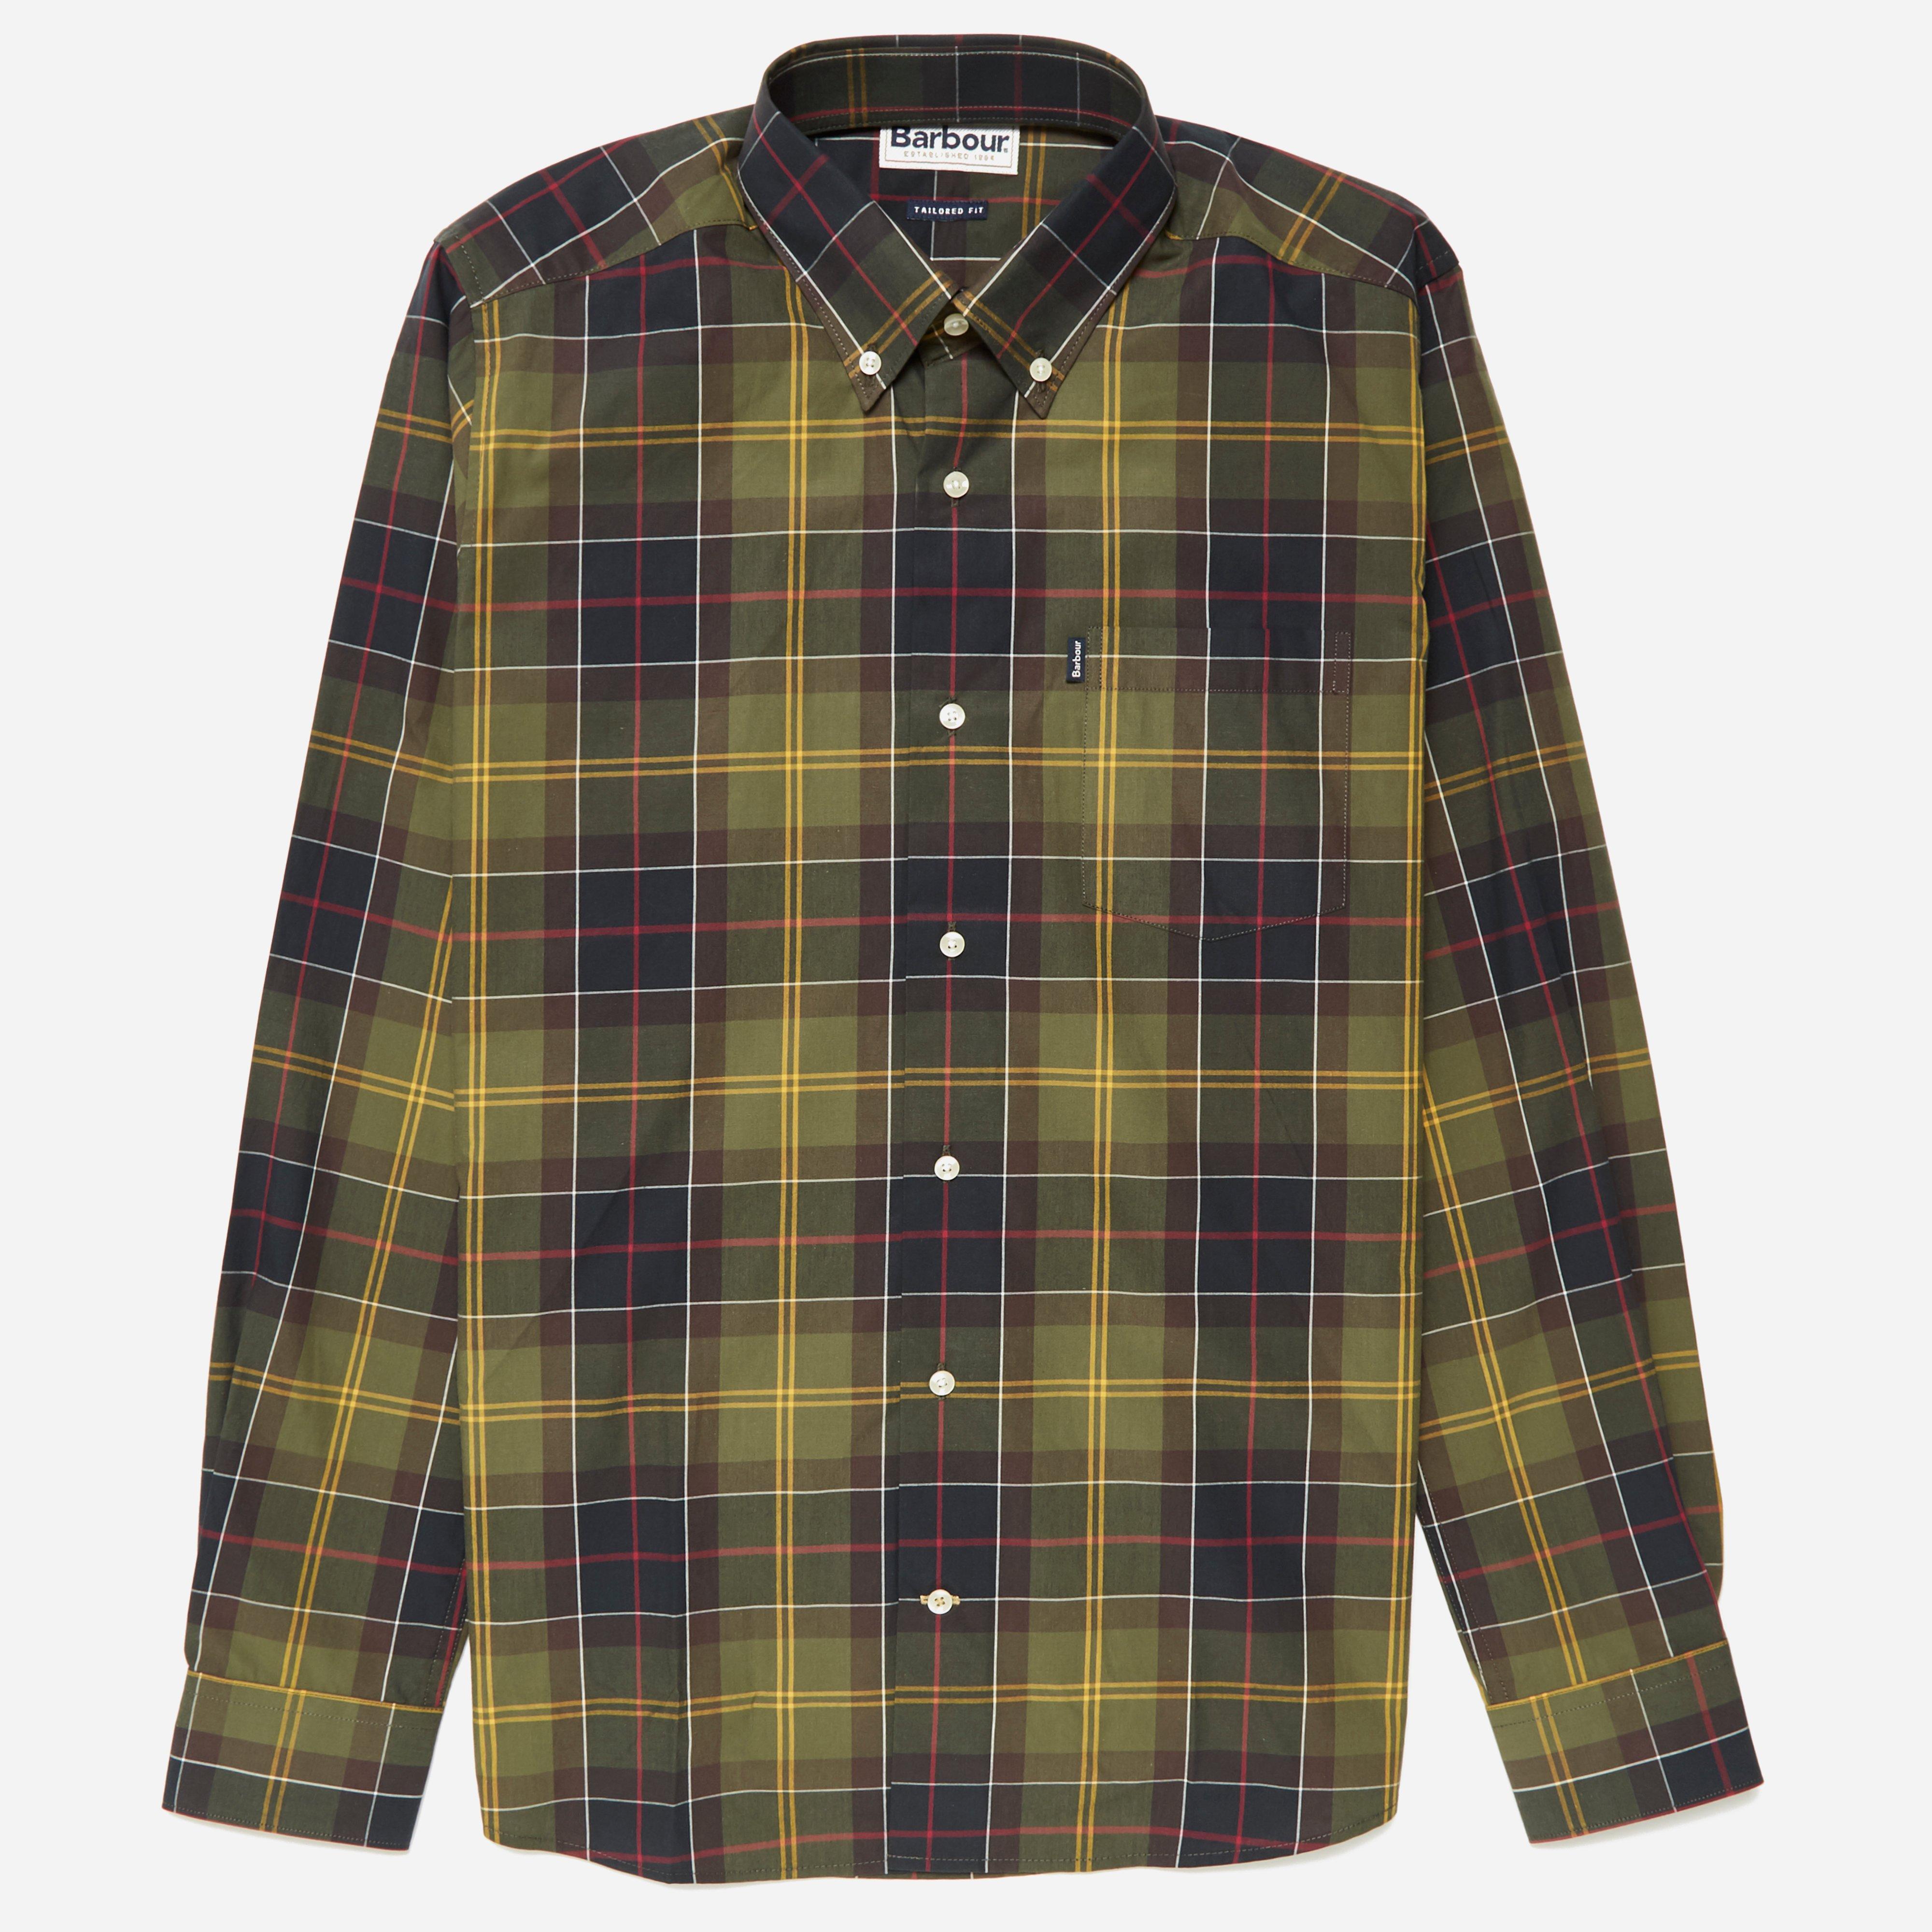 Barbour Herbert Shirt